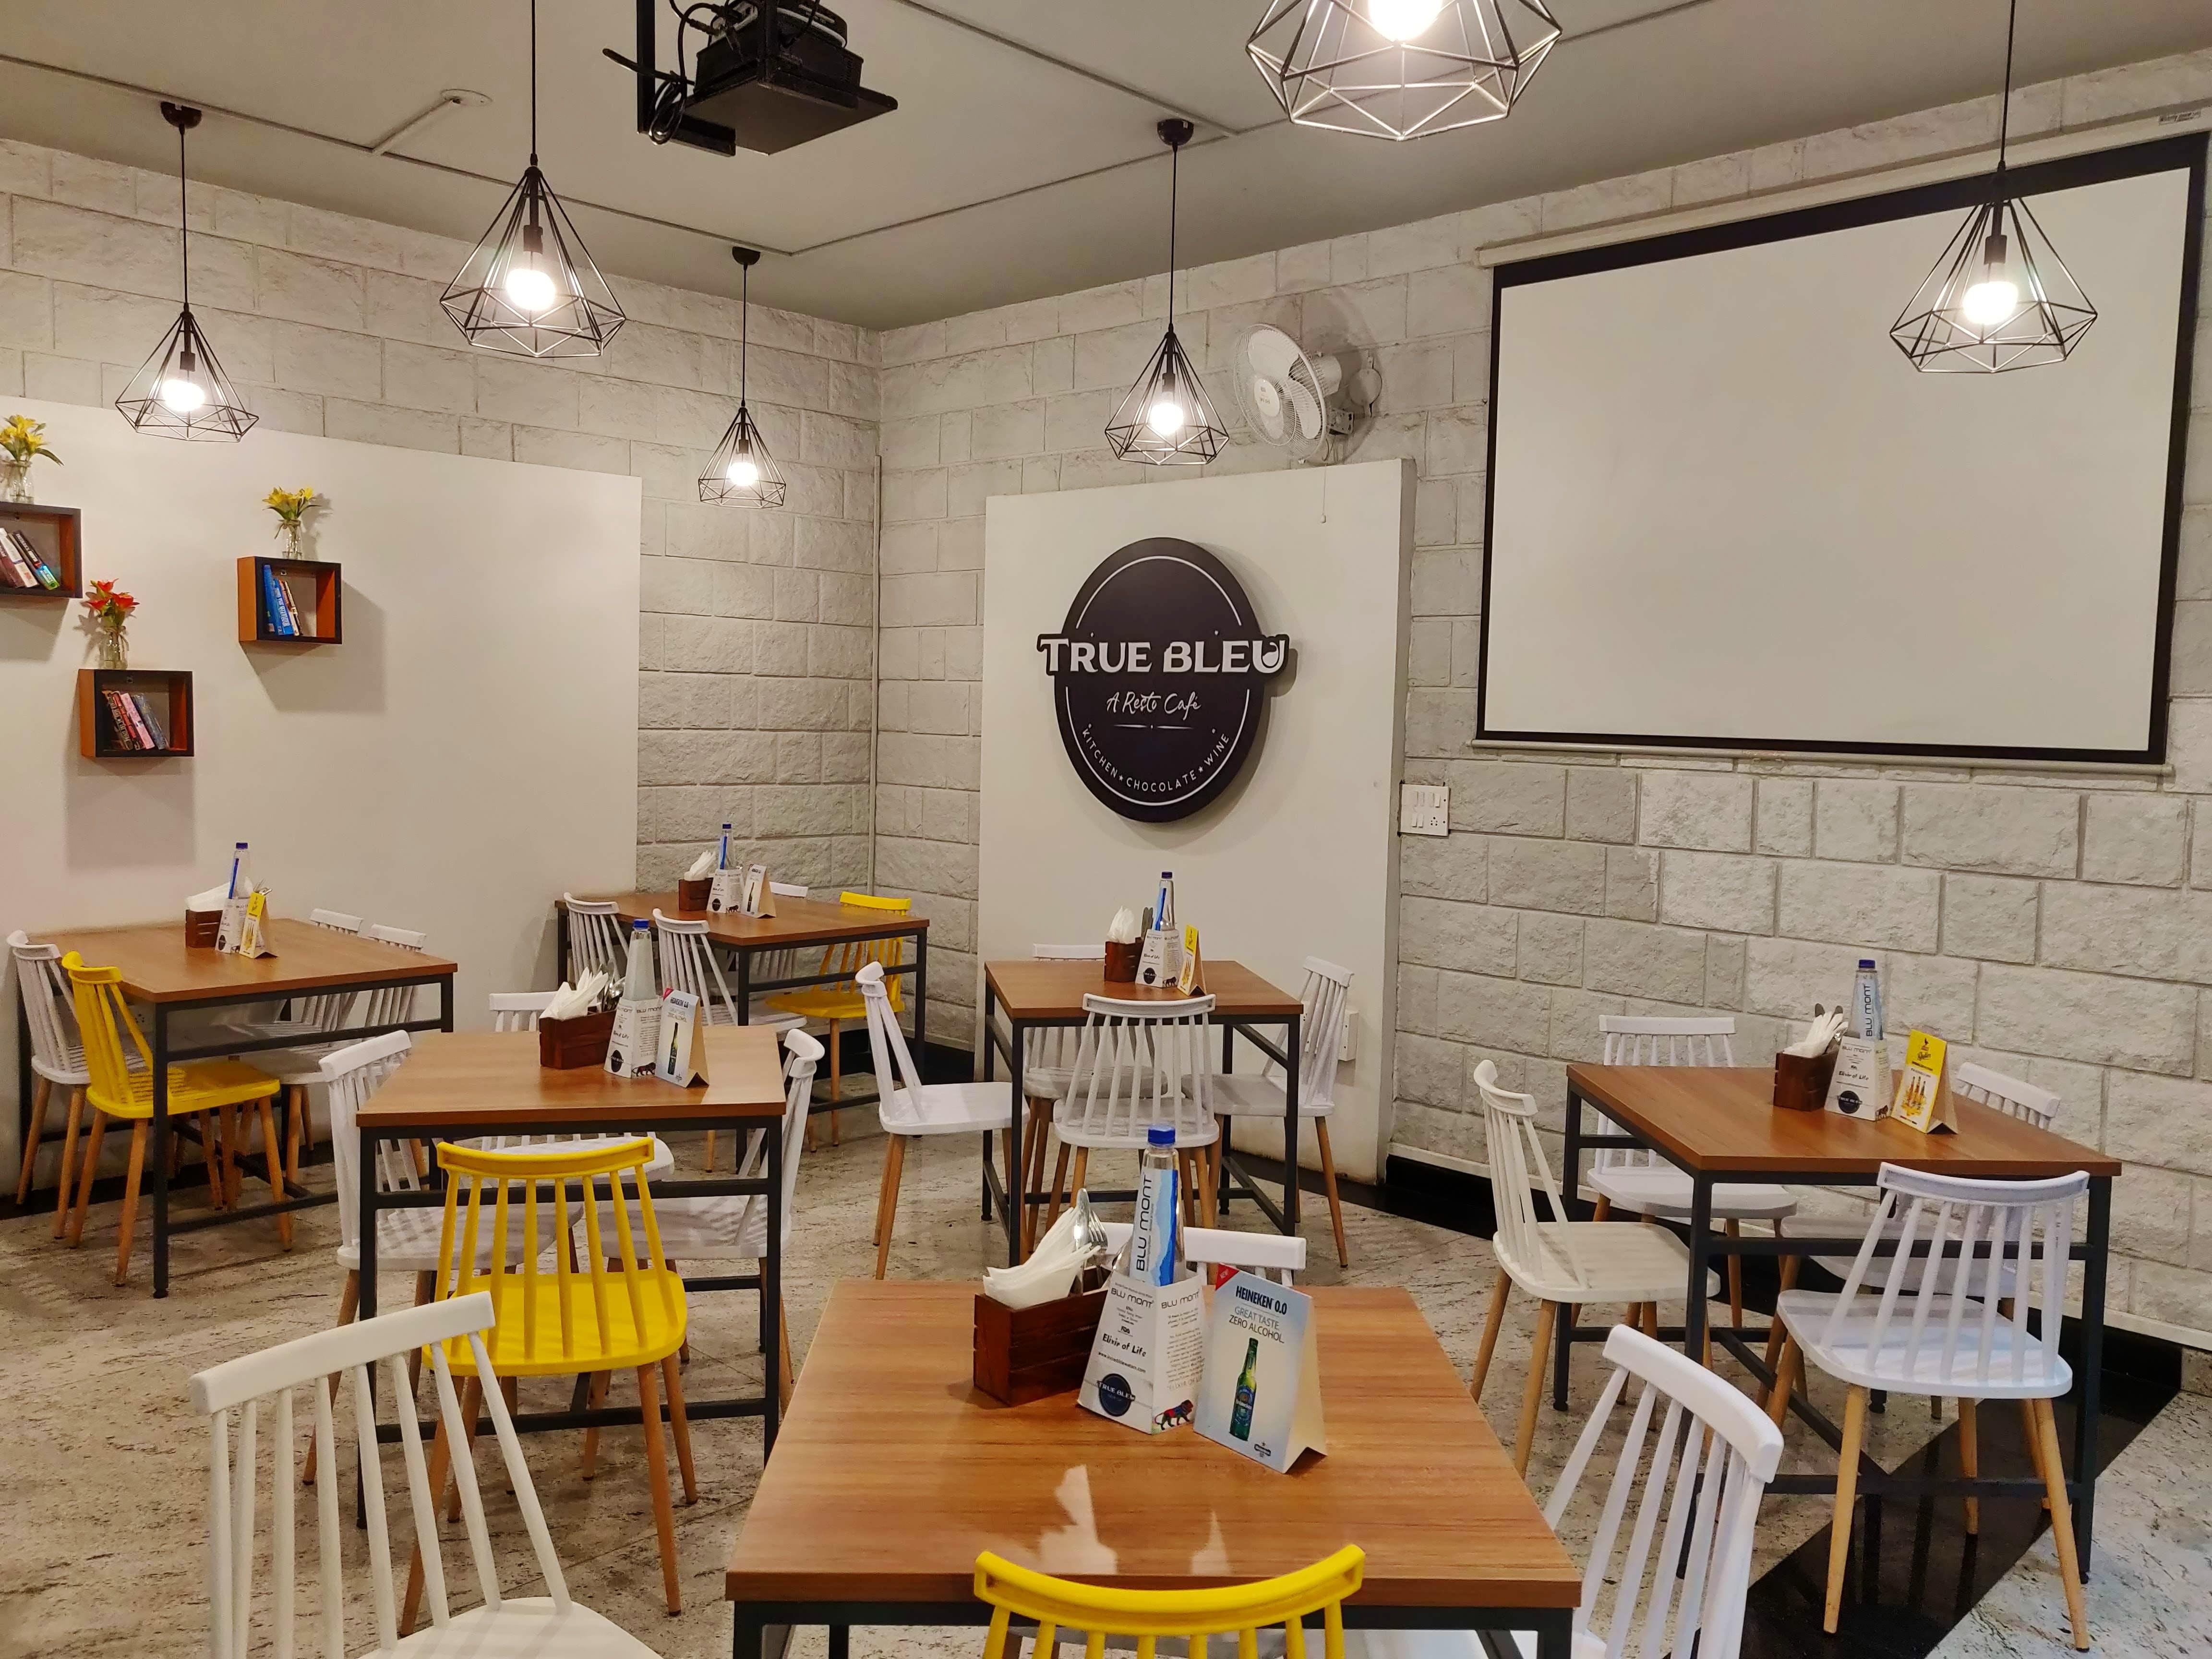 Room,Restaurant,Yellow,Building,Interior design,Table,Furniture,Dining room,Café,Cafeteria